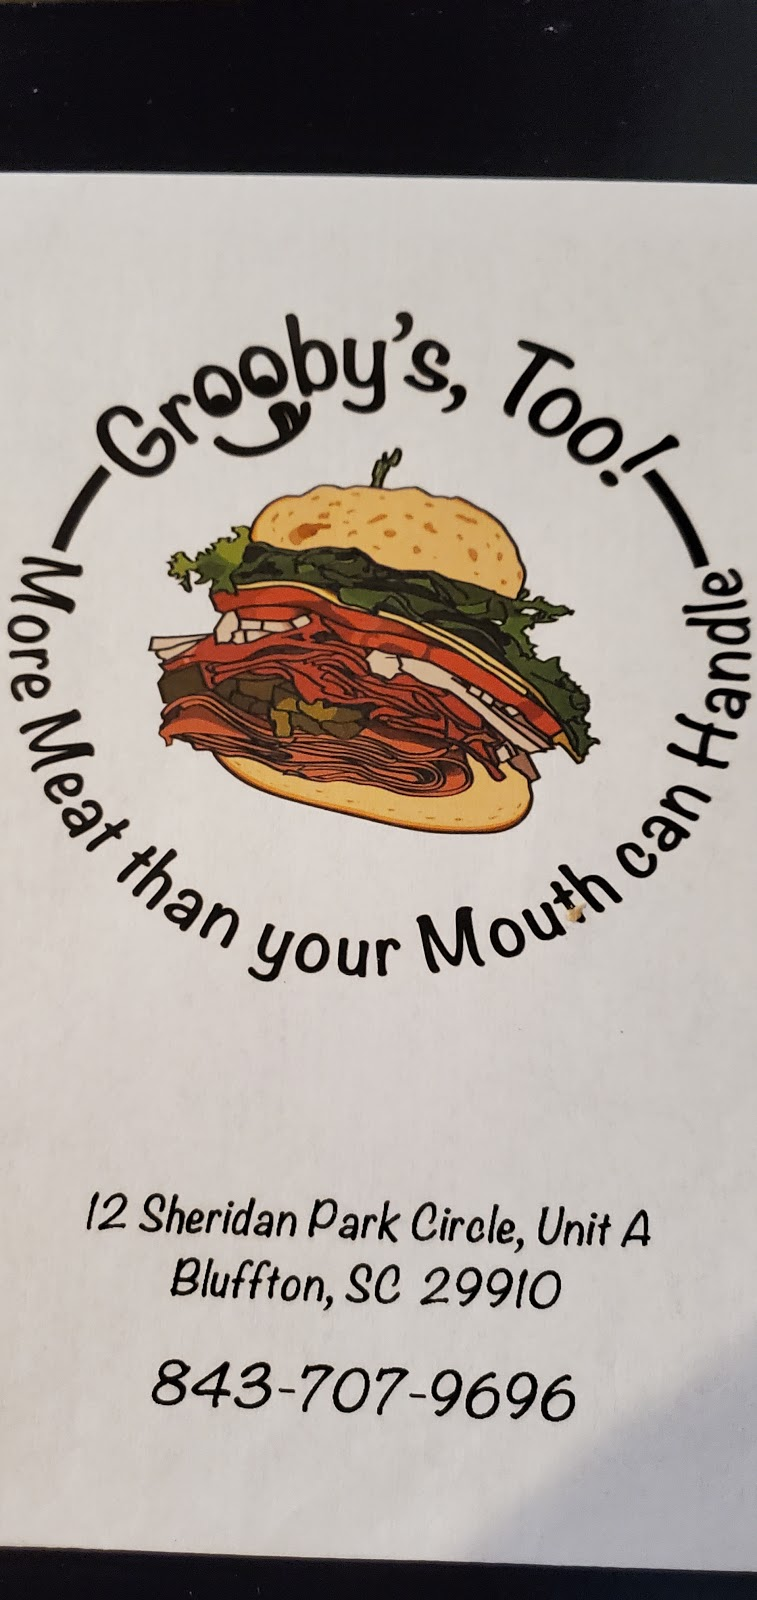 Groobys Too! | restaurant | 12a Sheridan Park Cir, Bluffton, SC 29910, USA | 8437079696 OR +1 843-707-9696